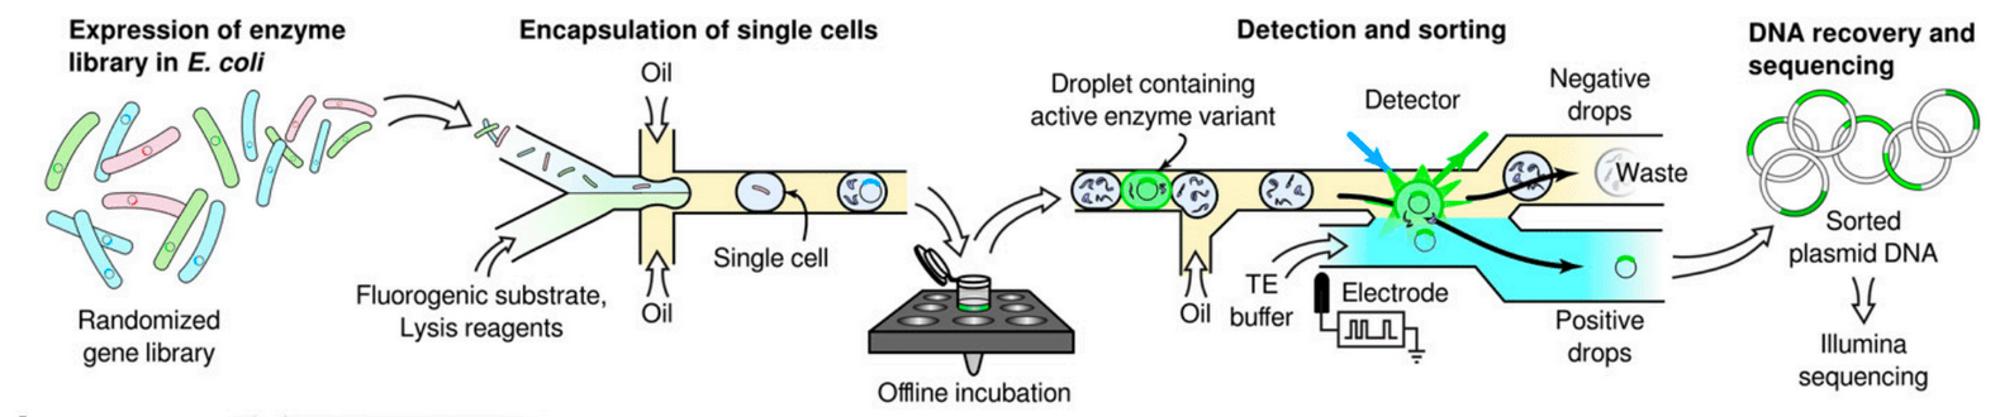 Overview of microfluidic screening workflow in droplets (from Romero  et al.  2015).